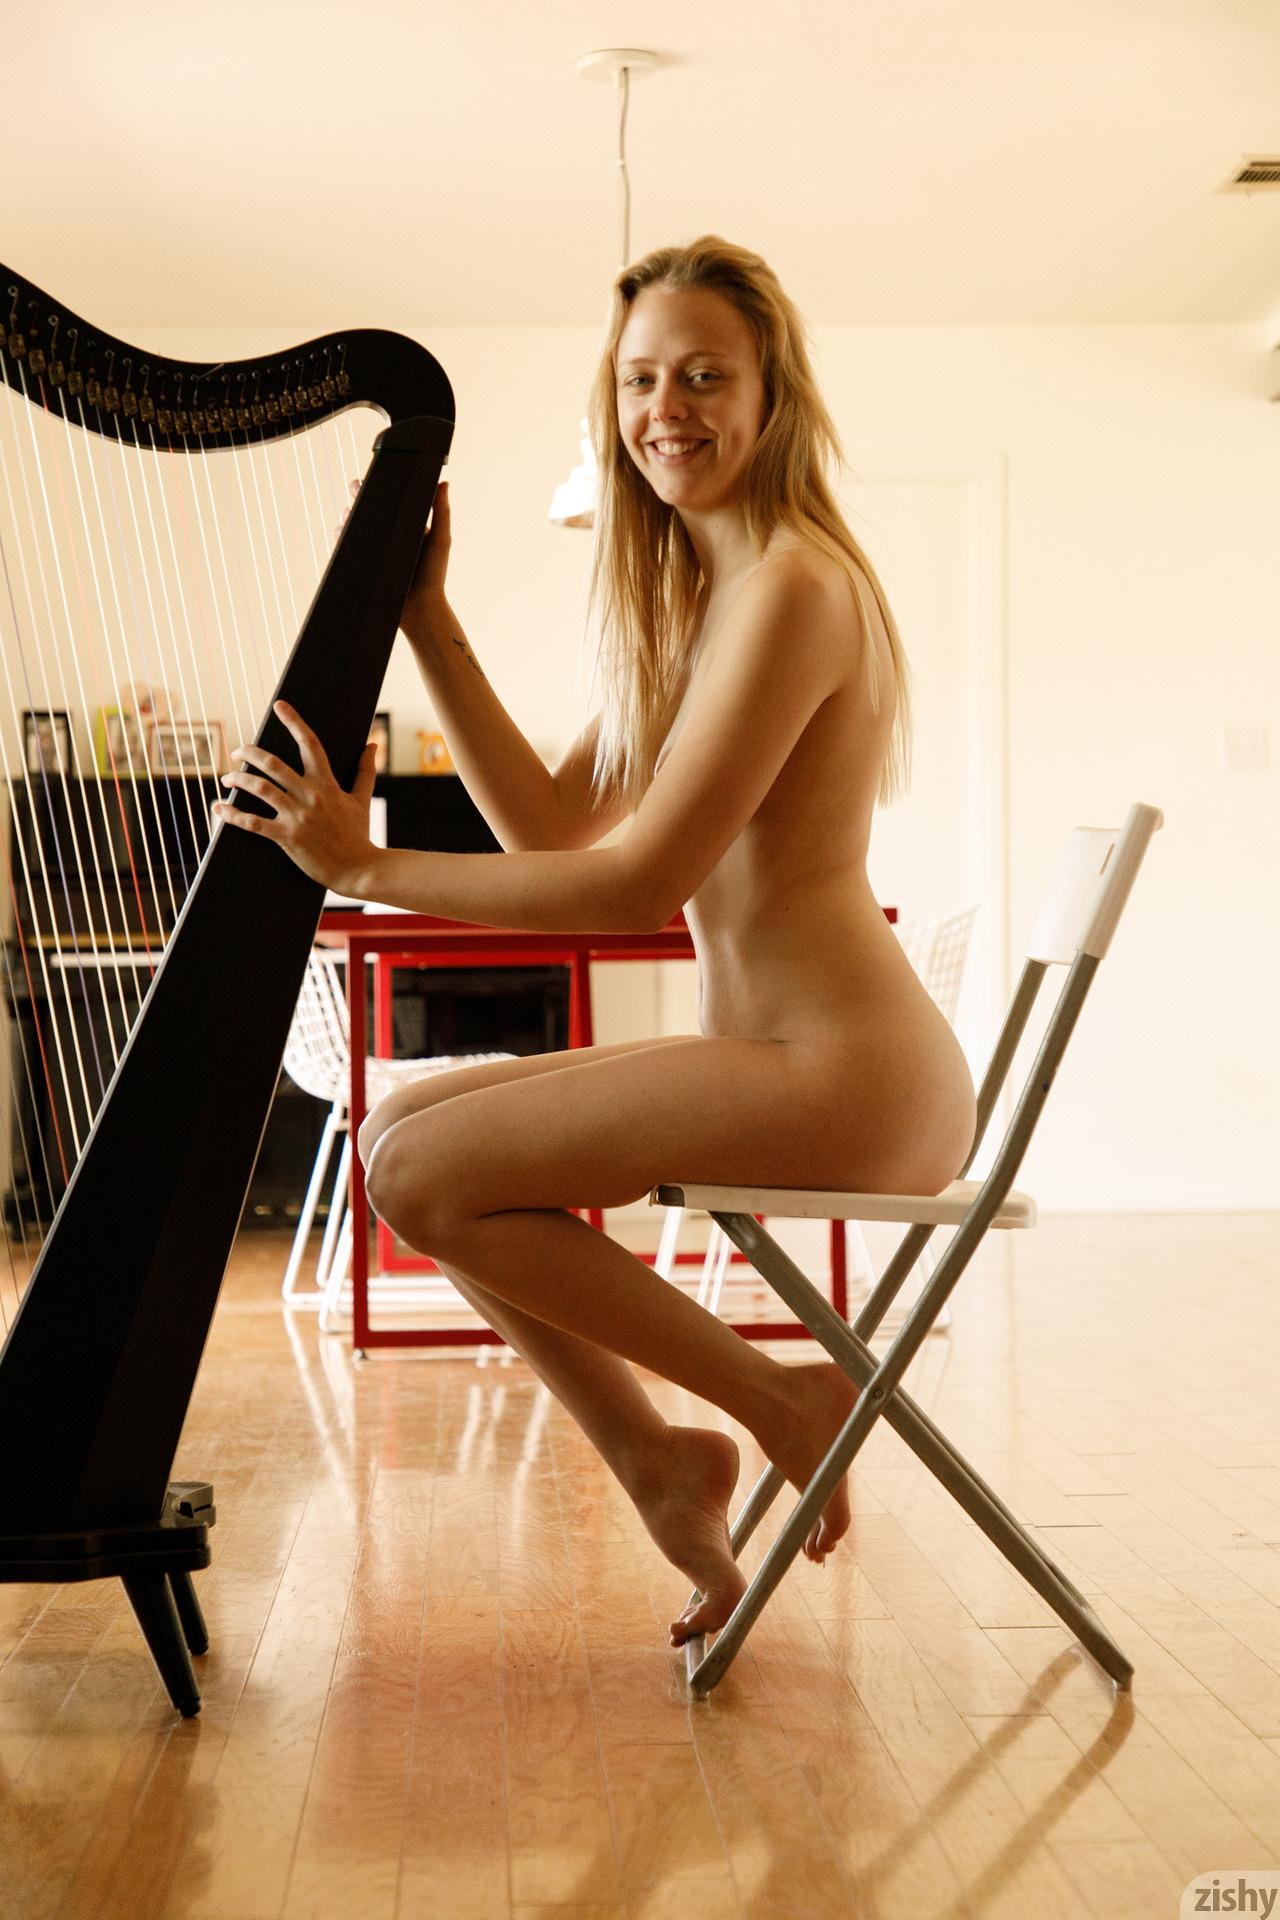 Helen Bergstrom Show Me Your Strings Zishy (27)